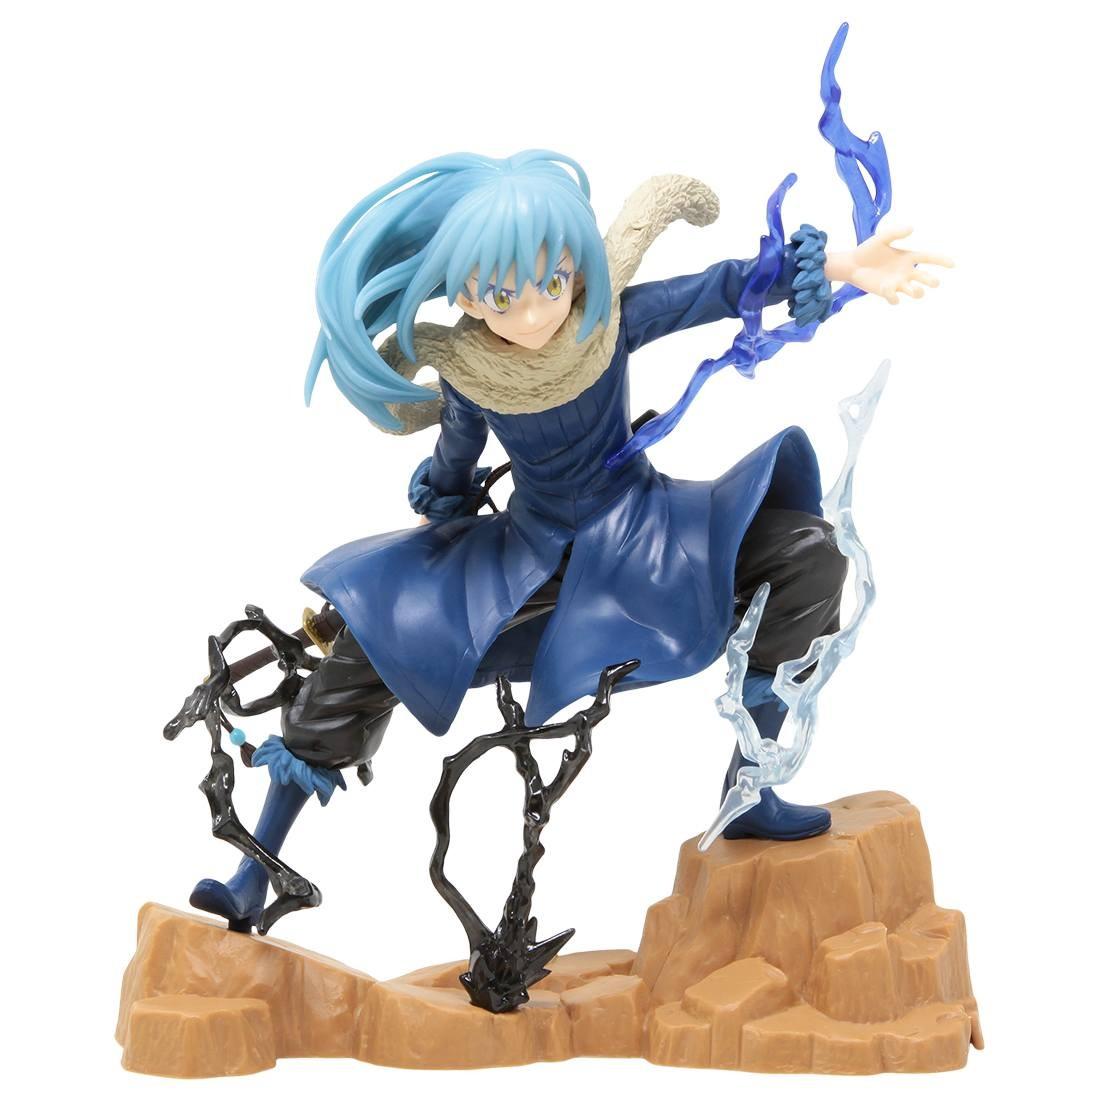 Banpresto That Time I Got Reincarnated As A Slime ESPRESTO est Tempest Effect And Motions Rimuru Tempest Figure (blue)